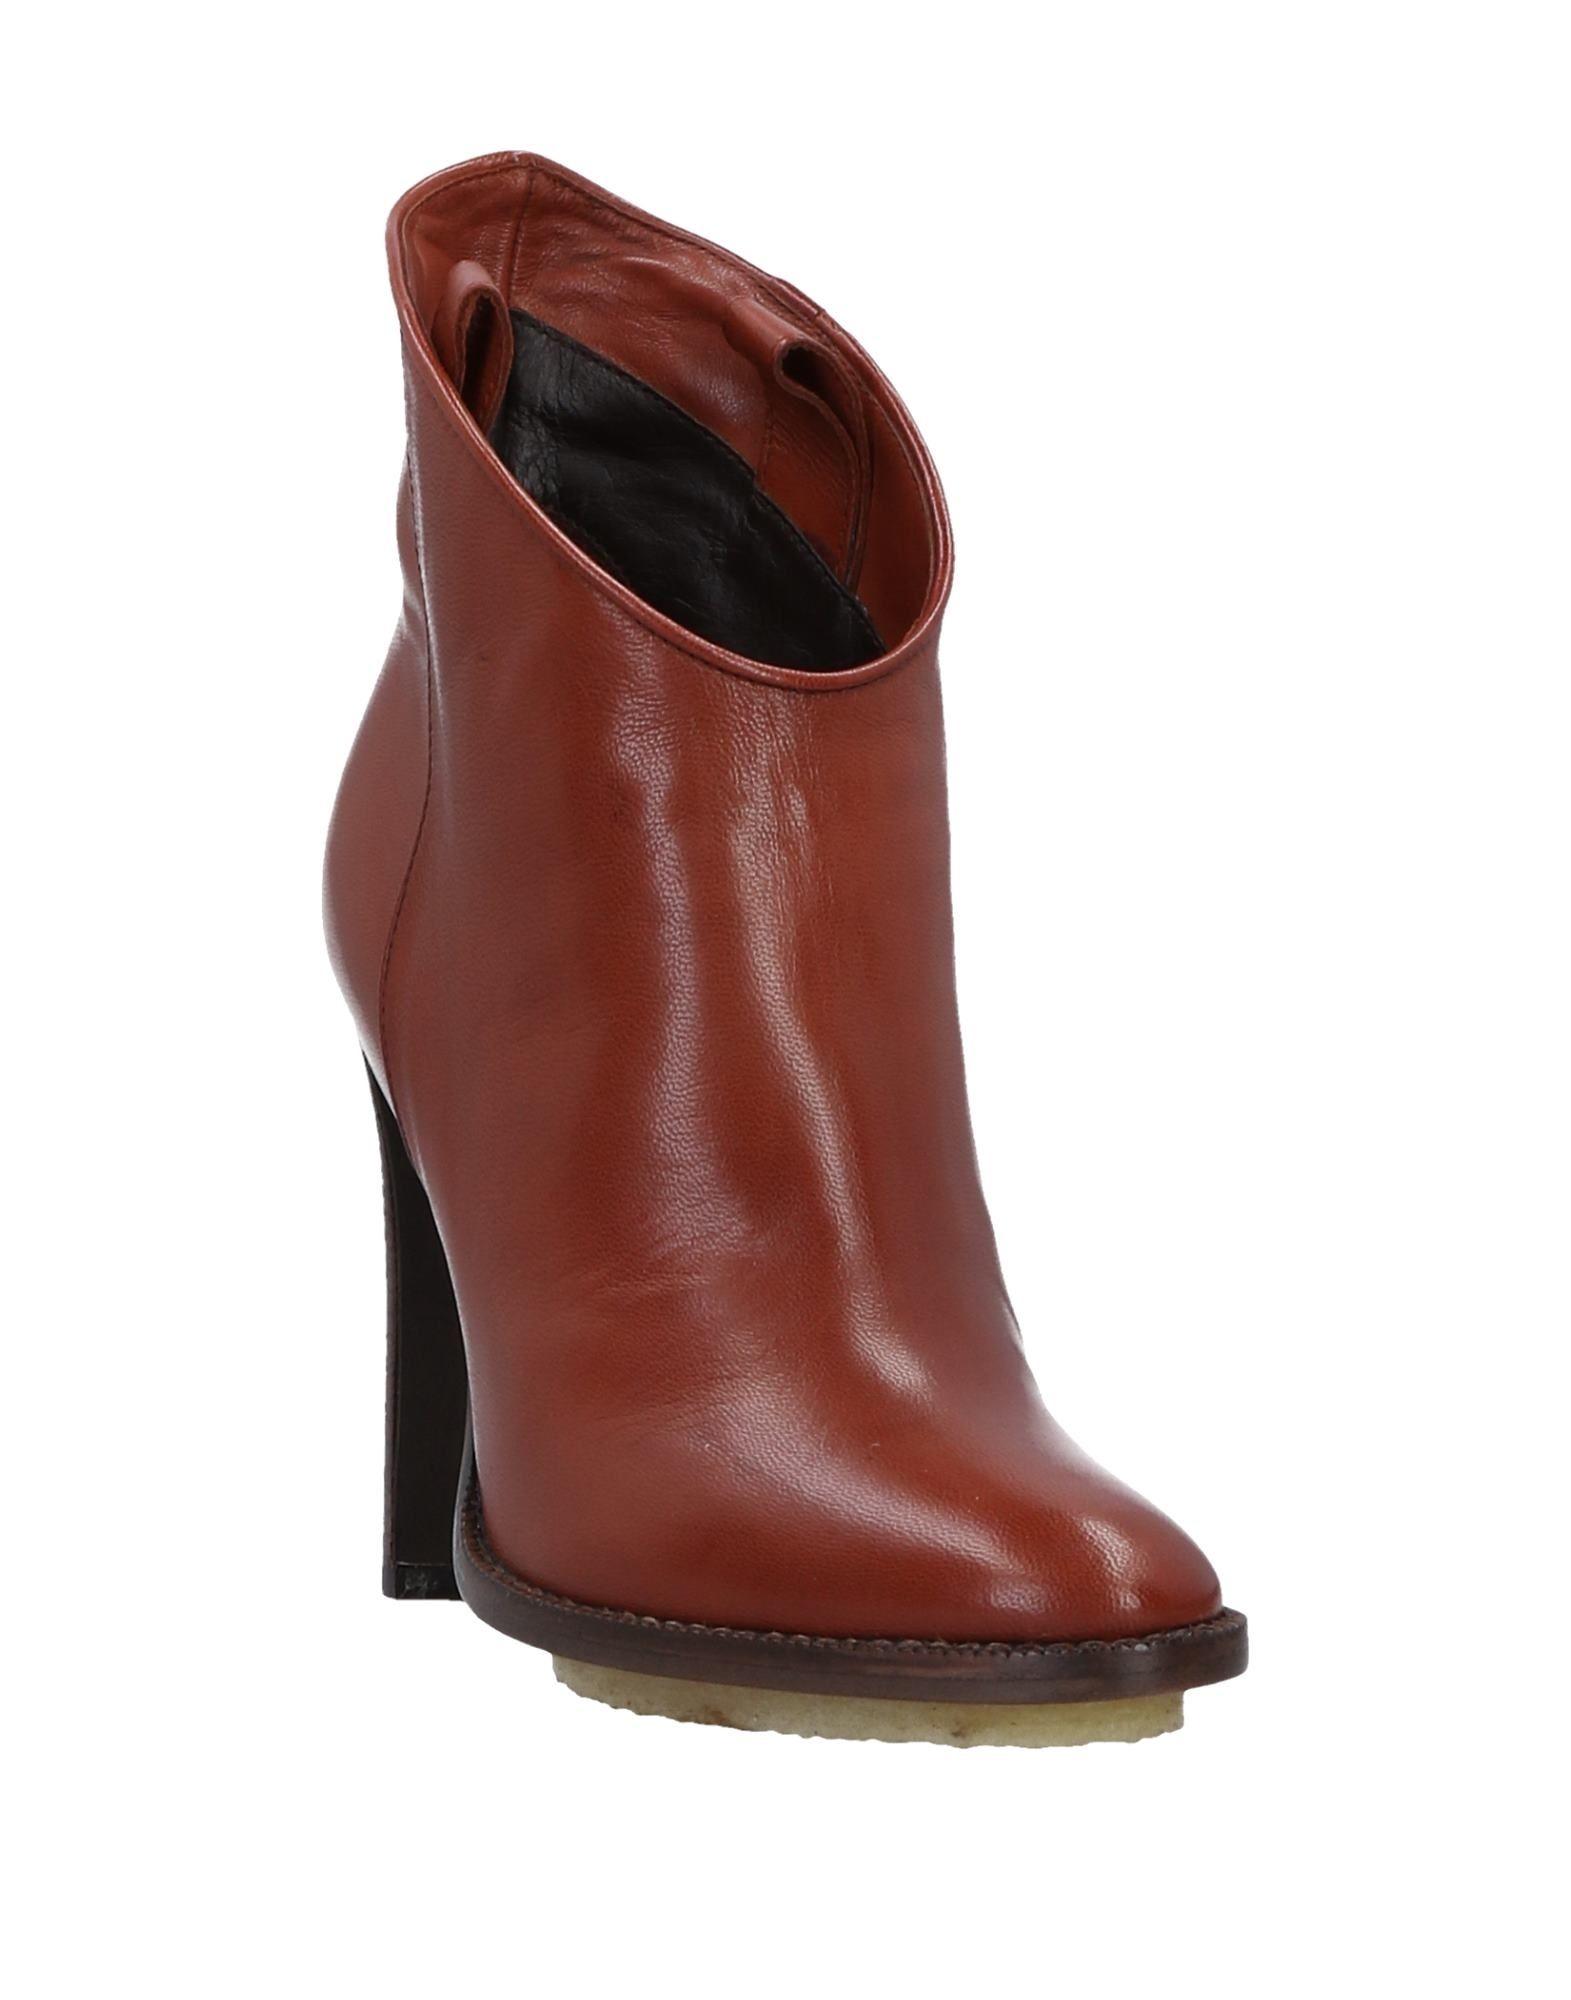 Rodolphe Menudier Stiefelette Damen Schuhe  11515400NWGünstige gut aussehende Schuhe Damen e055f9